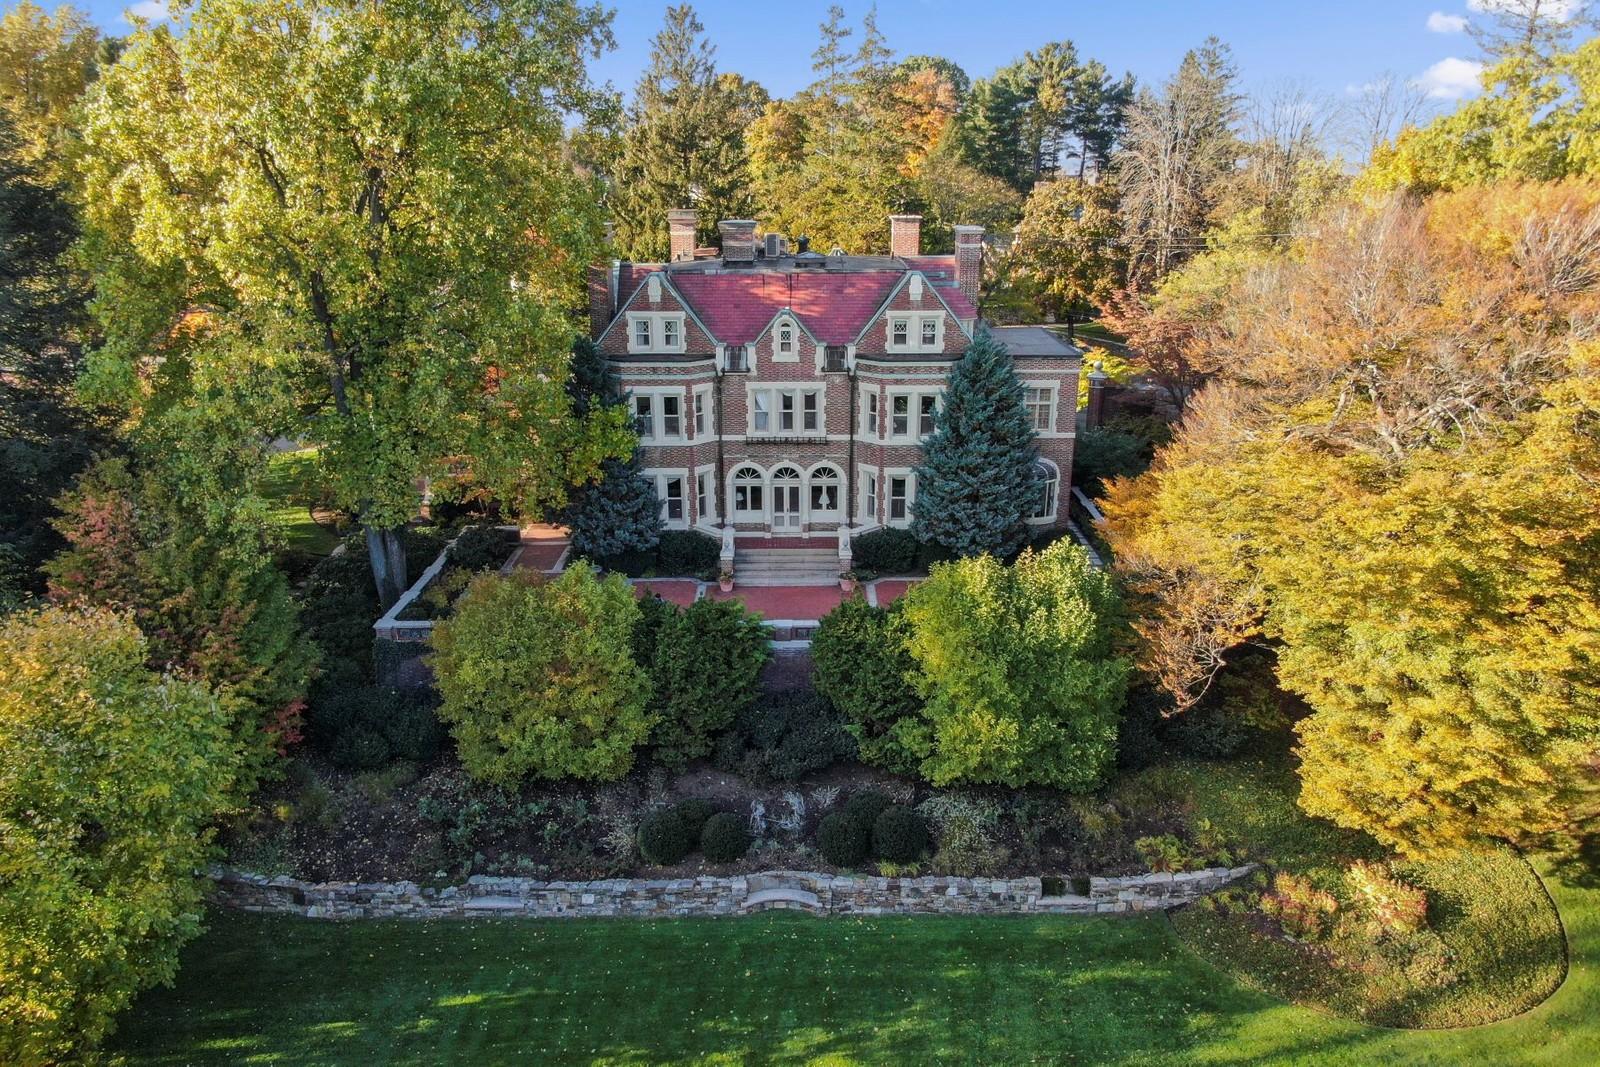 Single Family Home for Sale at 80 Seaver Street Brookline, Massachusetts 02445 United States